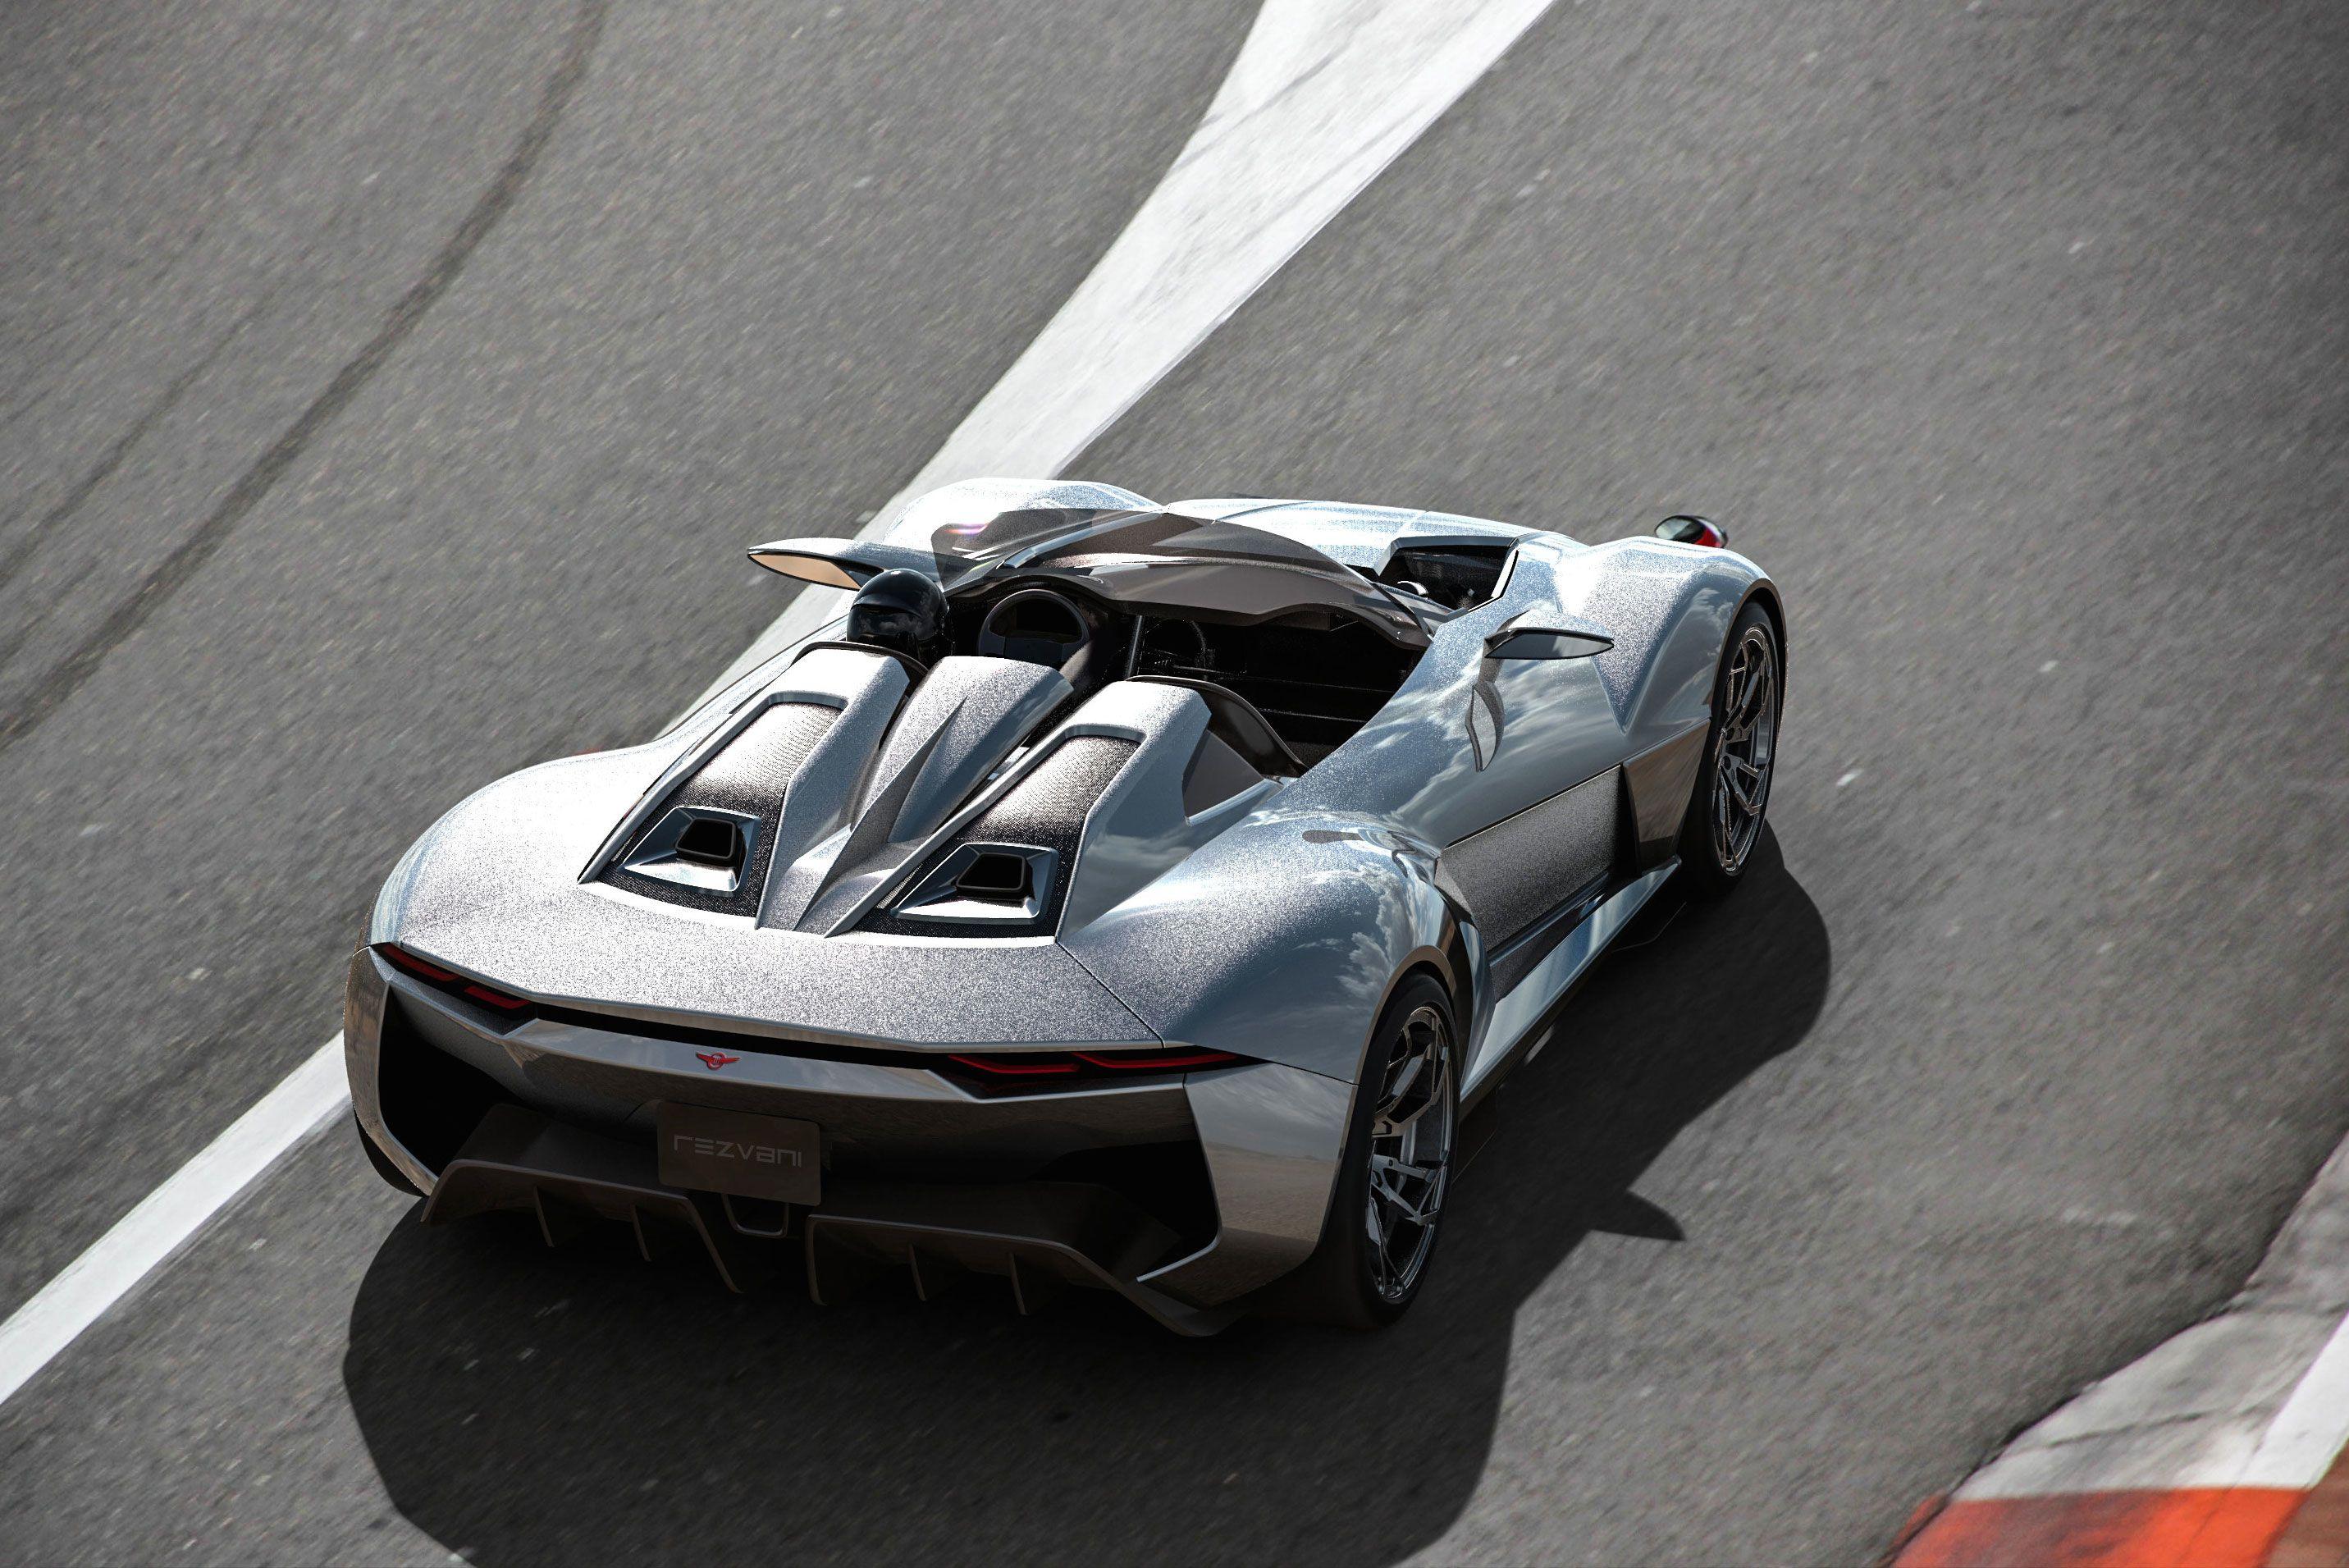 Rezvani Beast Super Cars Ariel Atom Beast